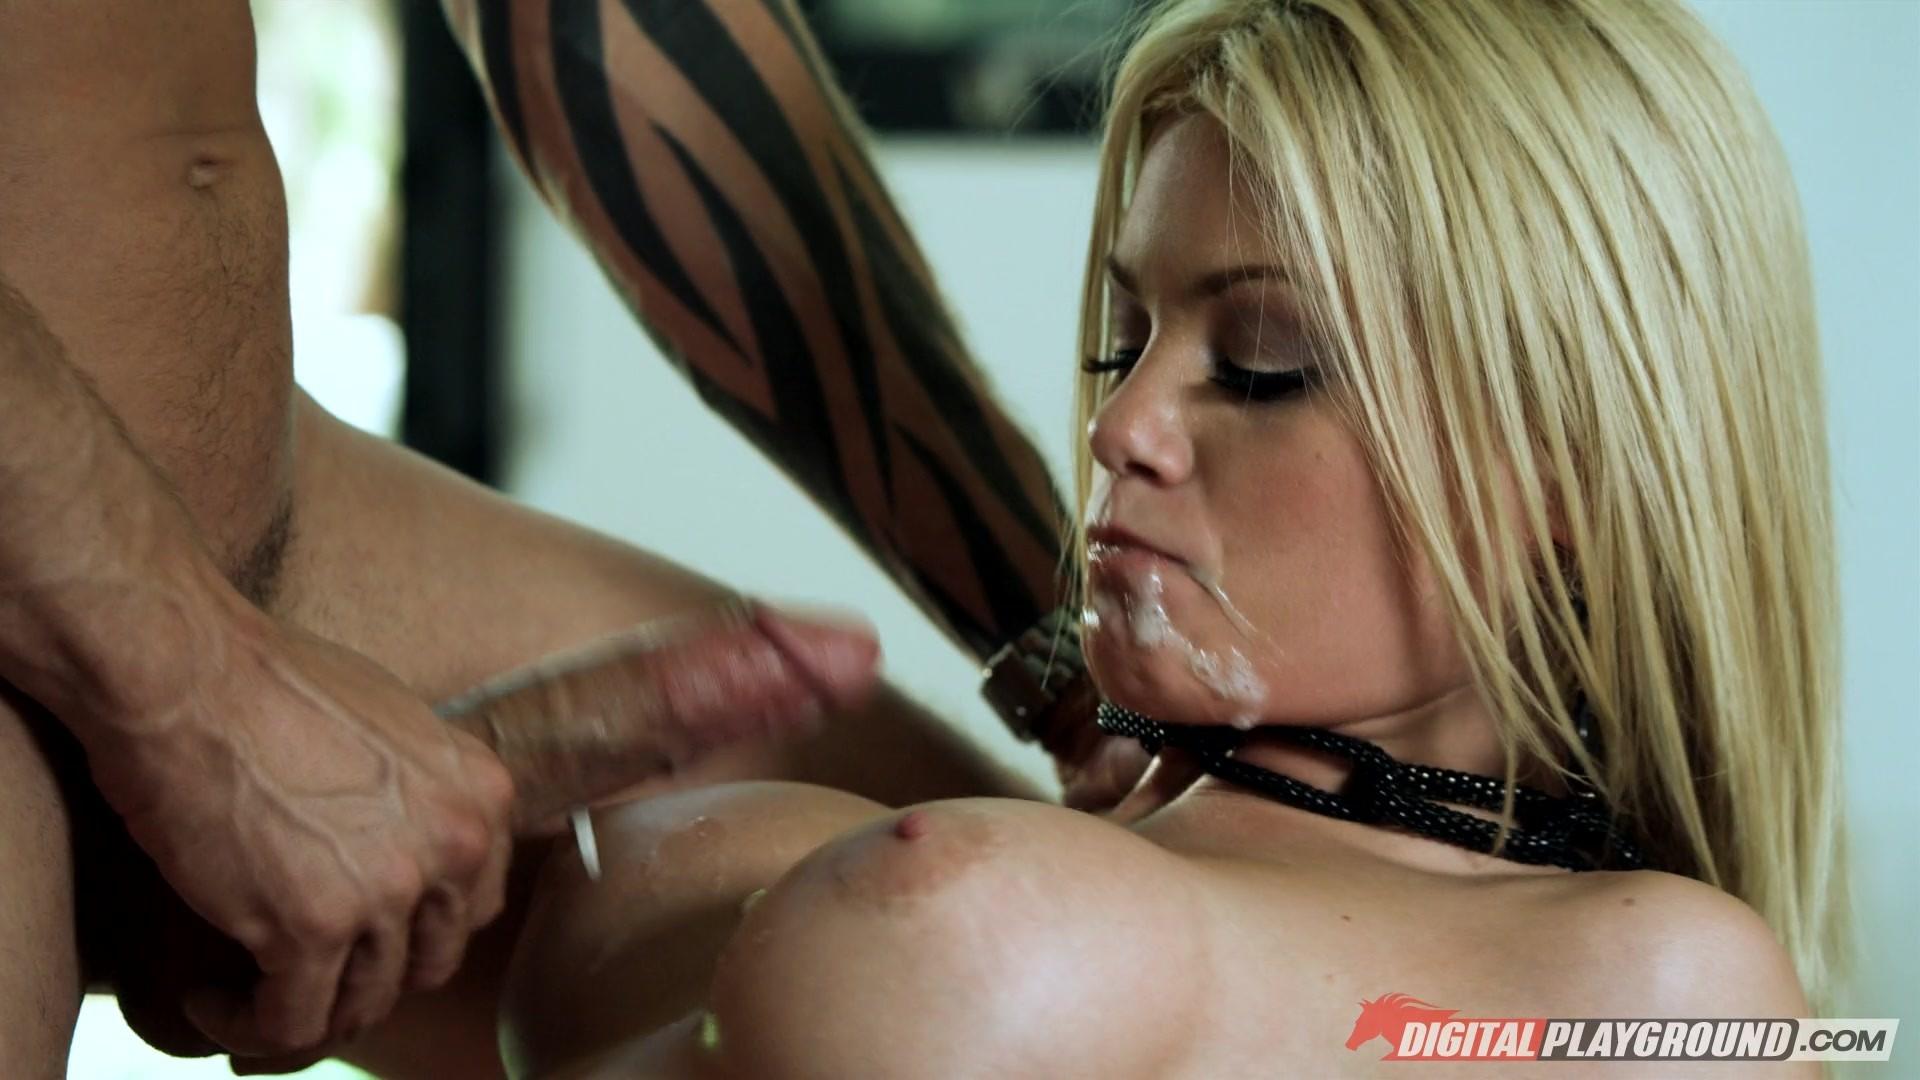 Tushyraw riley steele has incredible intense anal sex